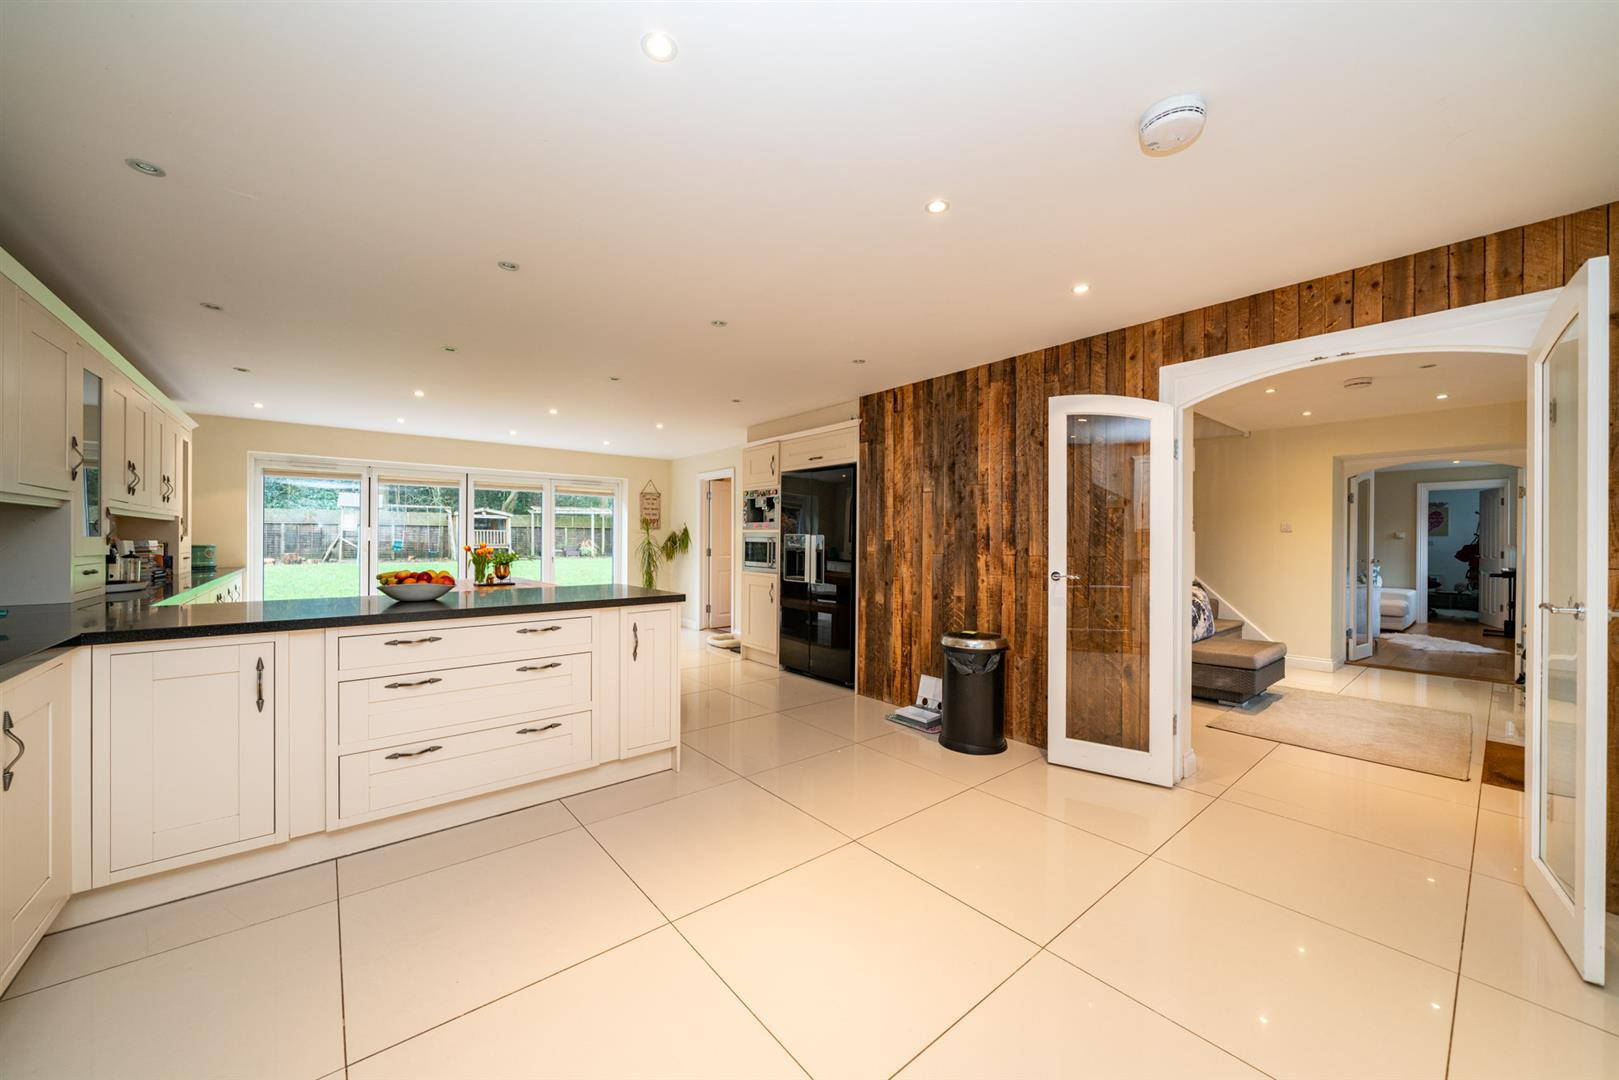 15-Hedgeside-5948 - kitchen looking to hallway.jpg